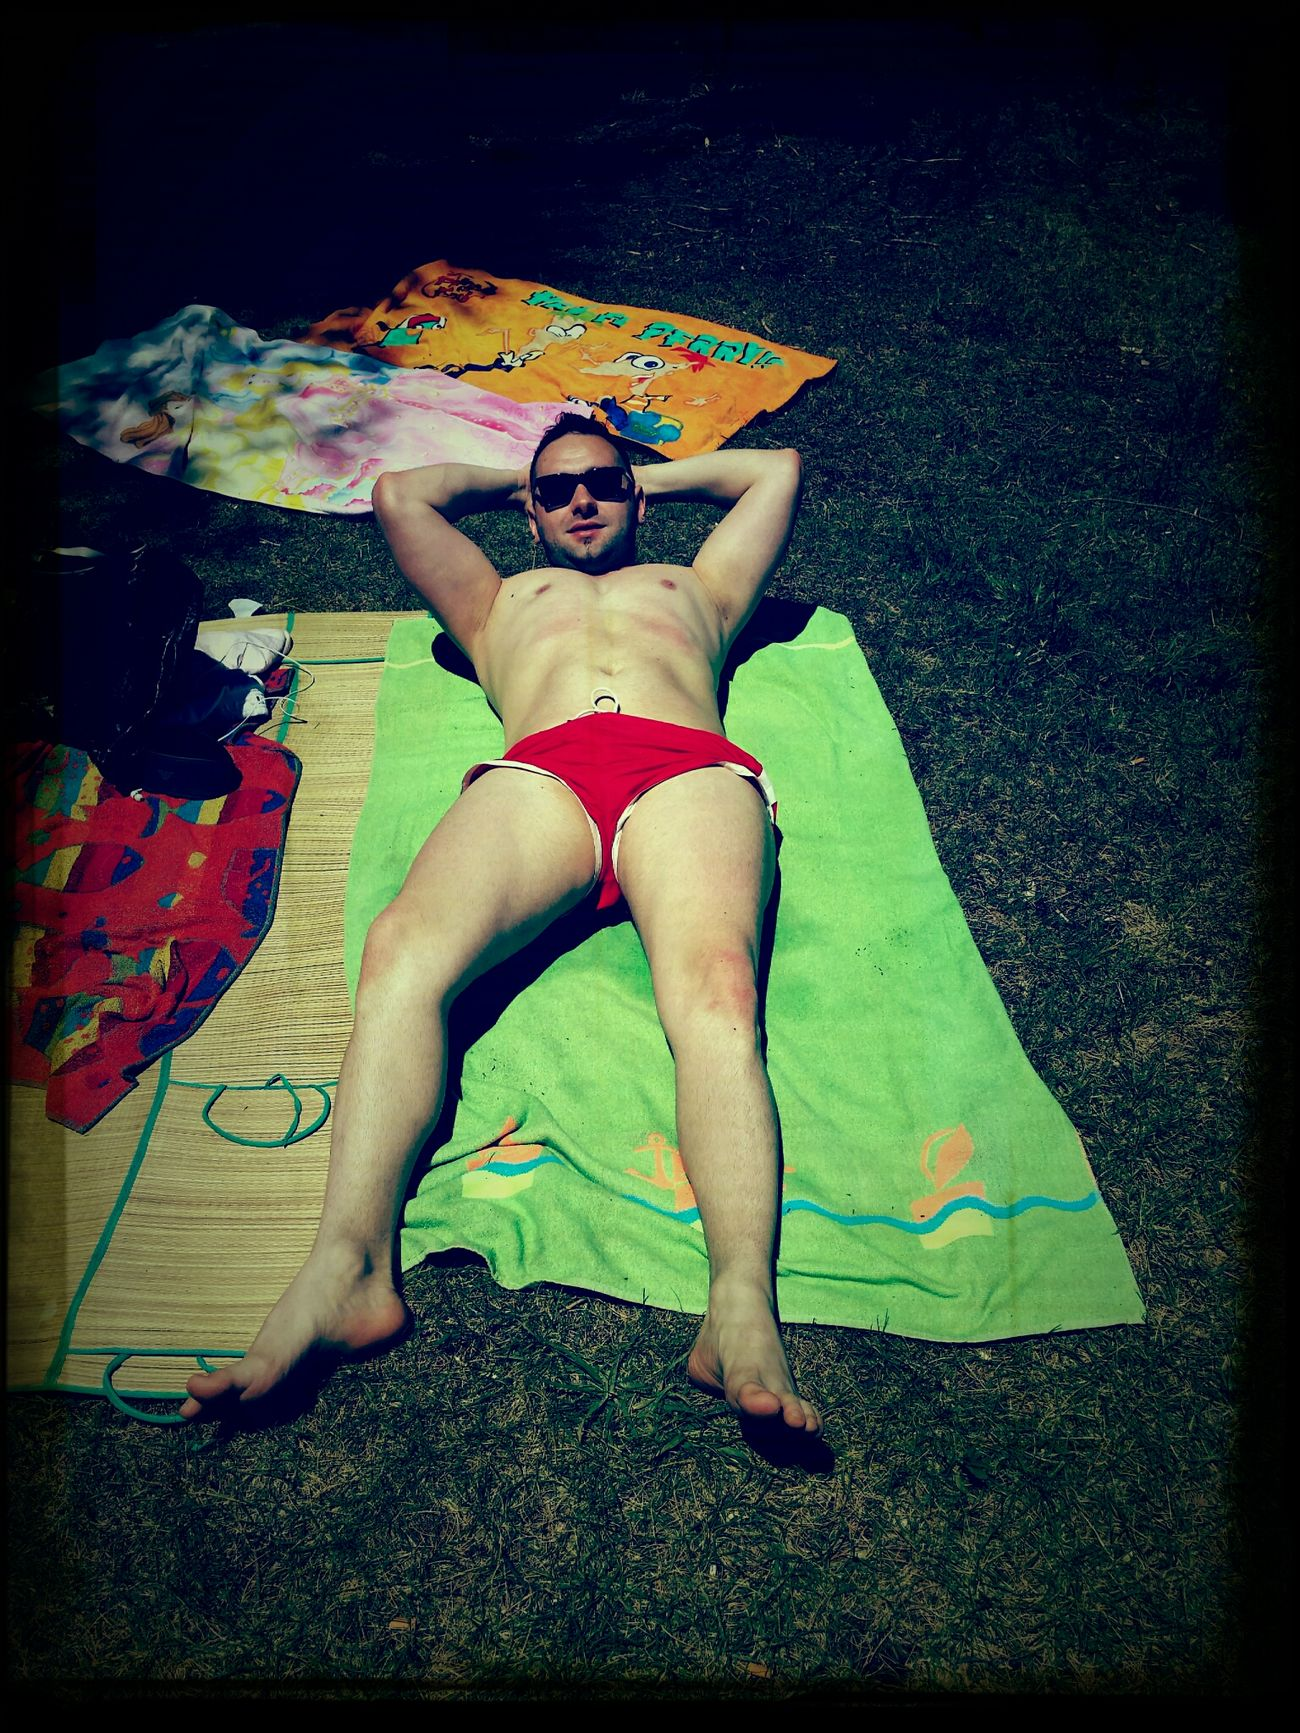 Enjoying The Sun ...primer día de sol...que blanquitoooooo!!!???